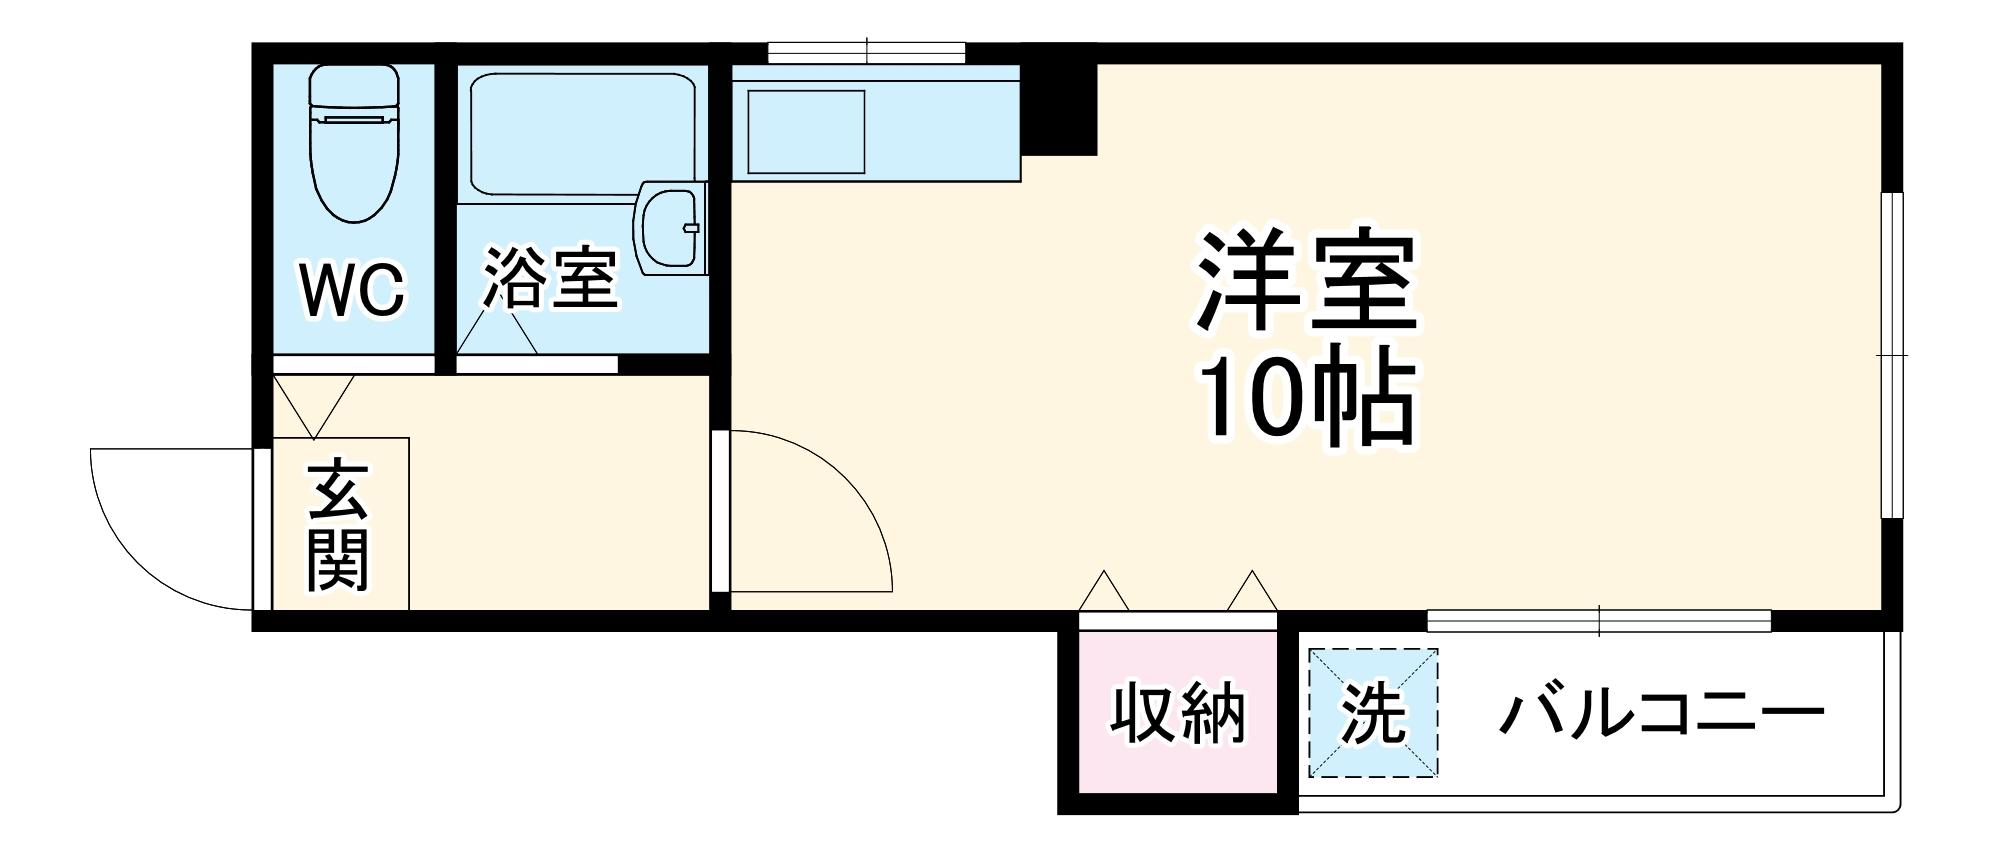 JPアパートメント豊中Ⅱ 405号室の間取り